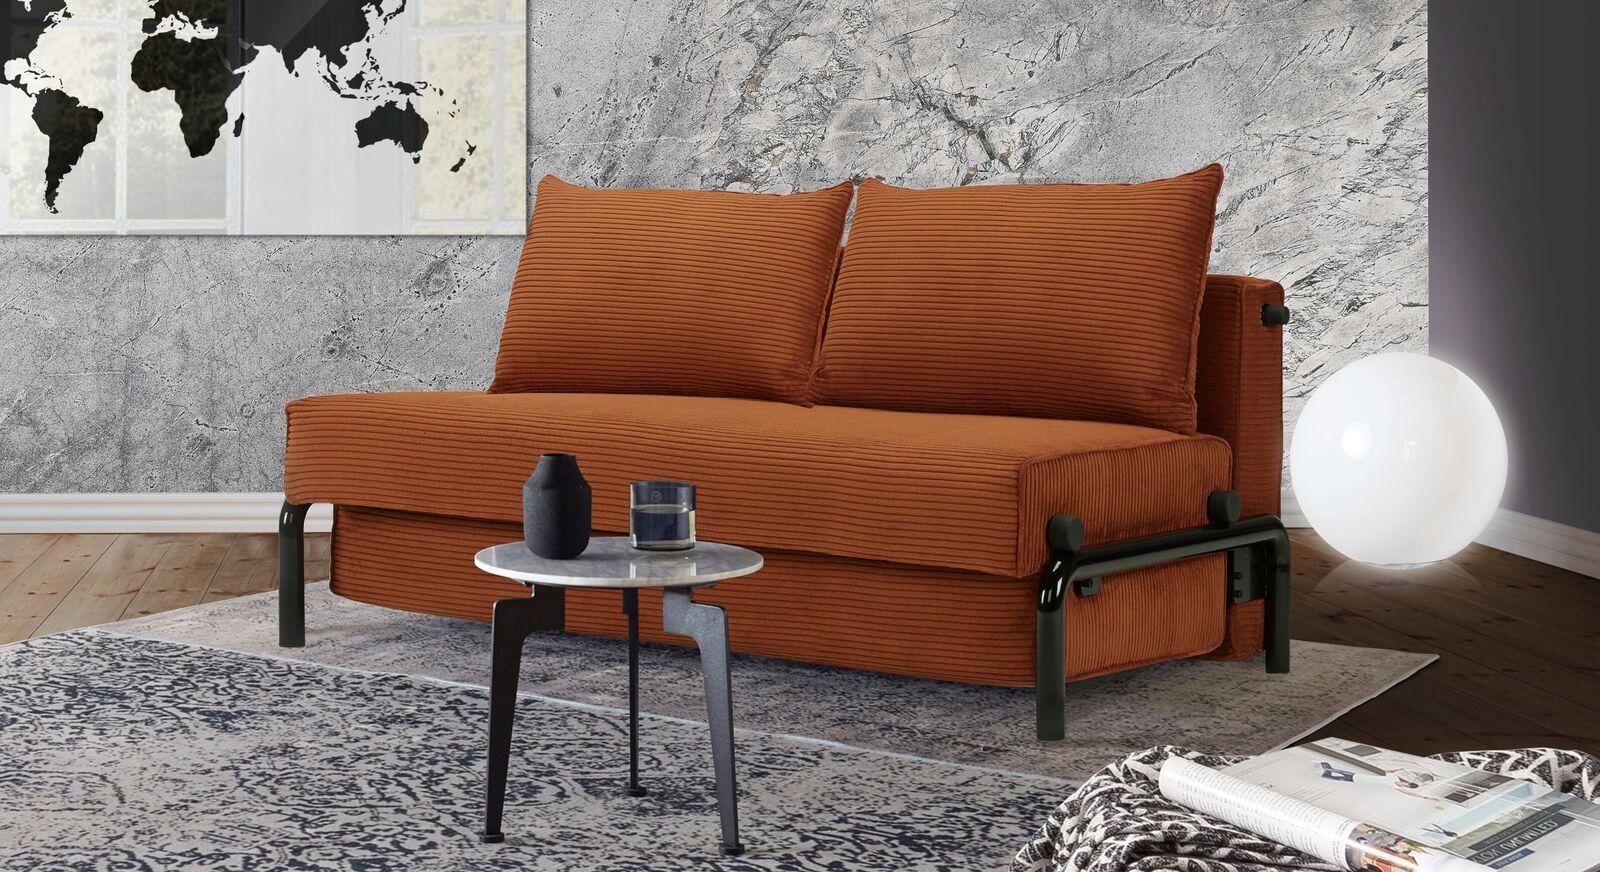 Modernes Schlafsofa Naoto mit orangenem Cordbezug